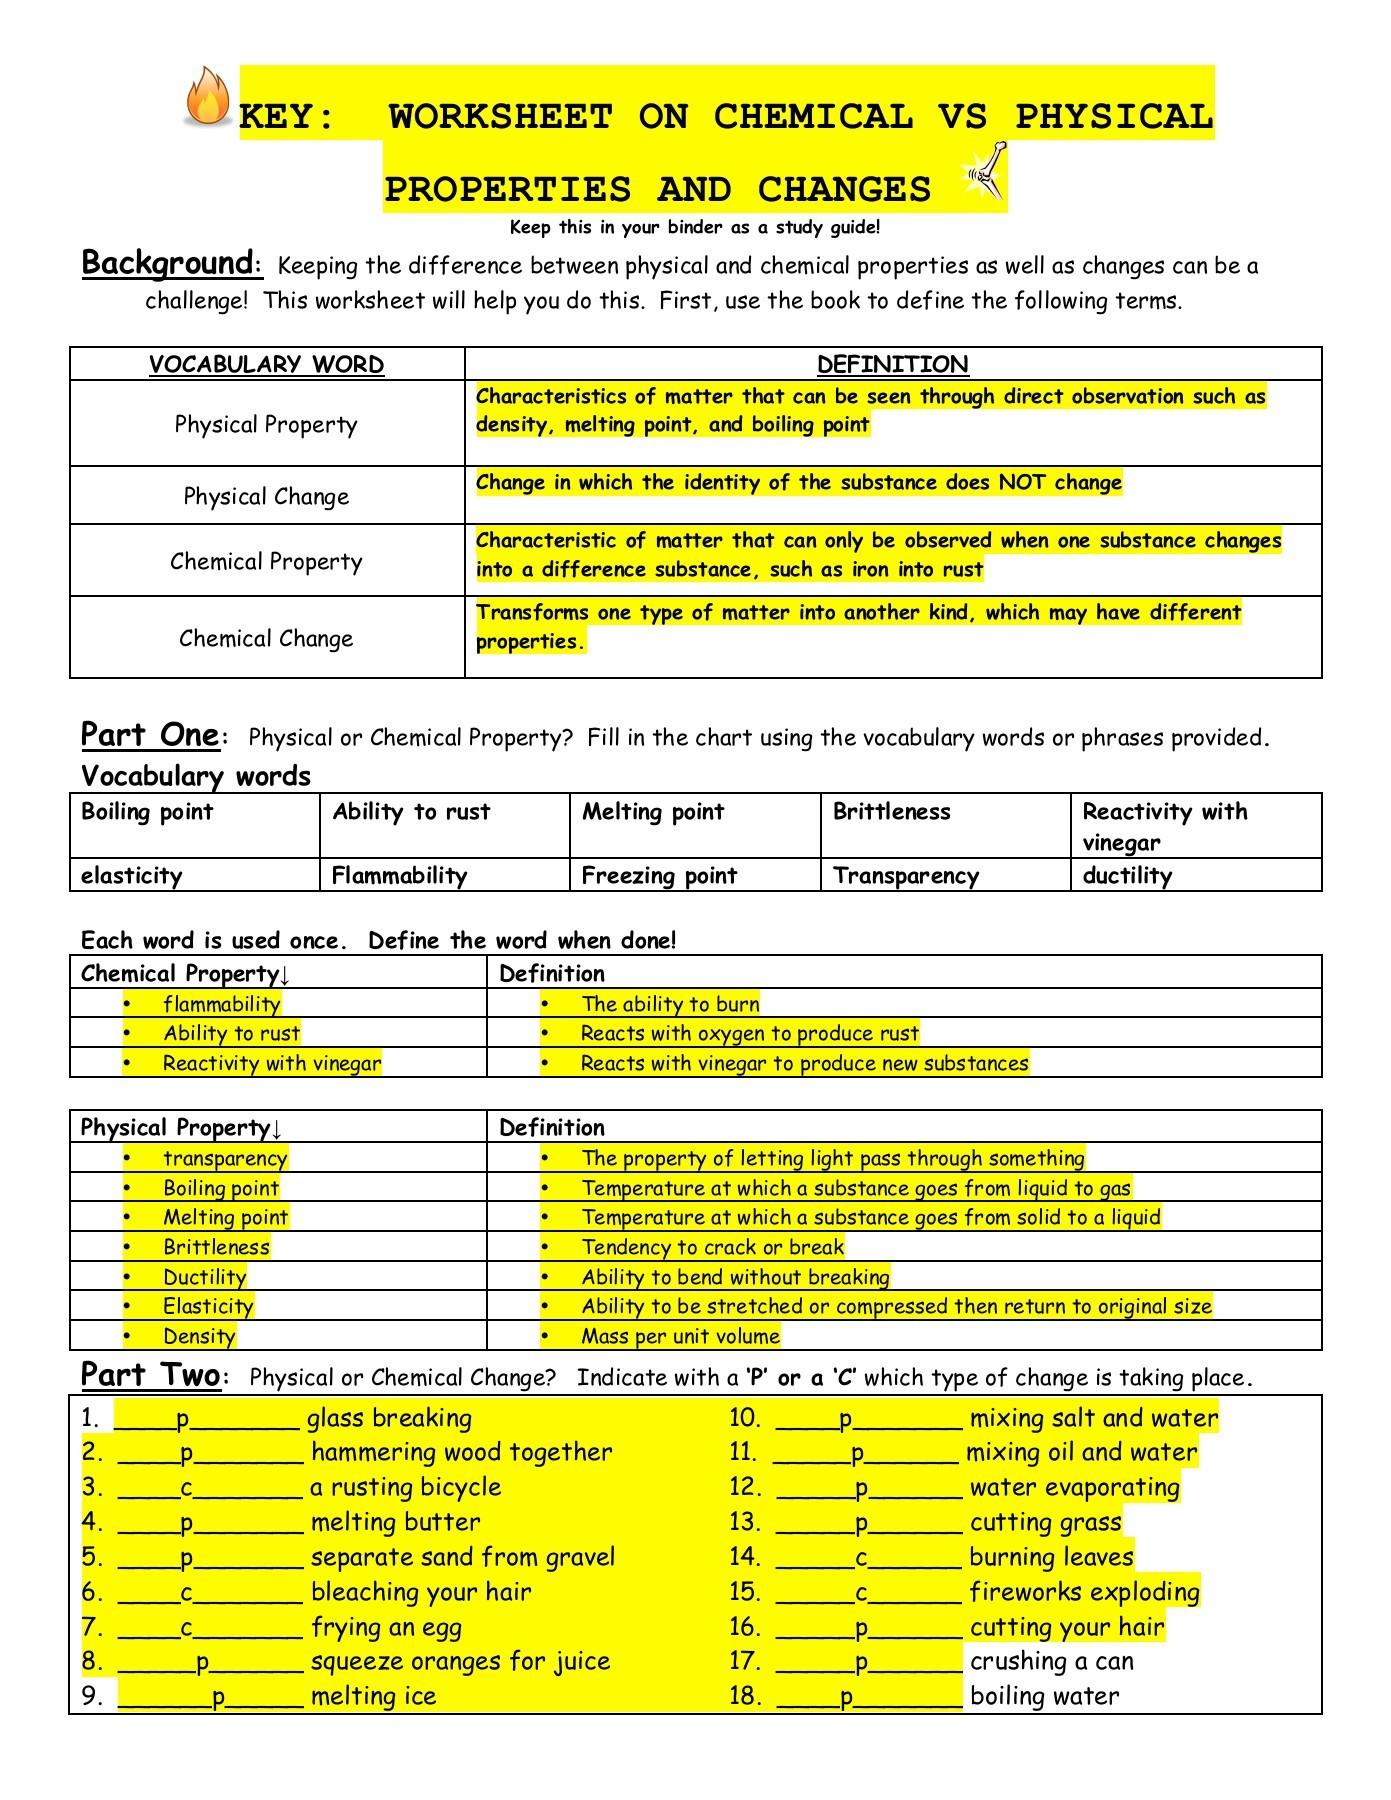 Worksheets Worksheet On Chemical Vs Physical Properties